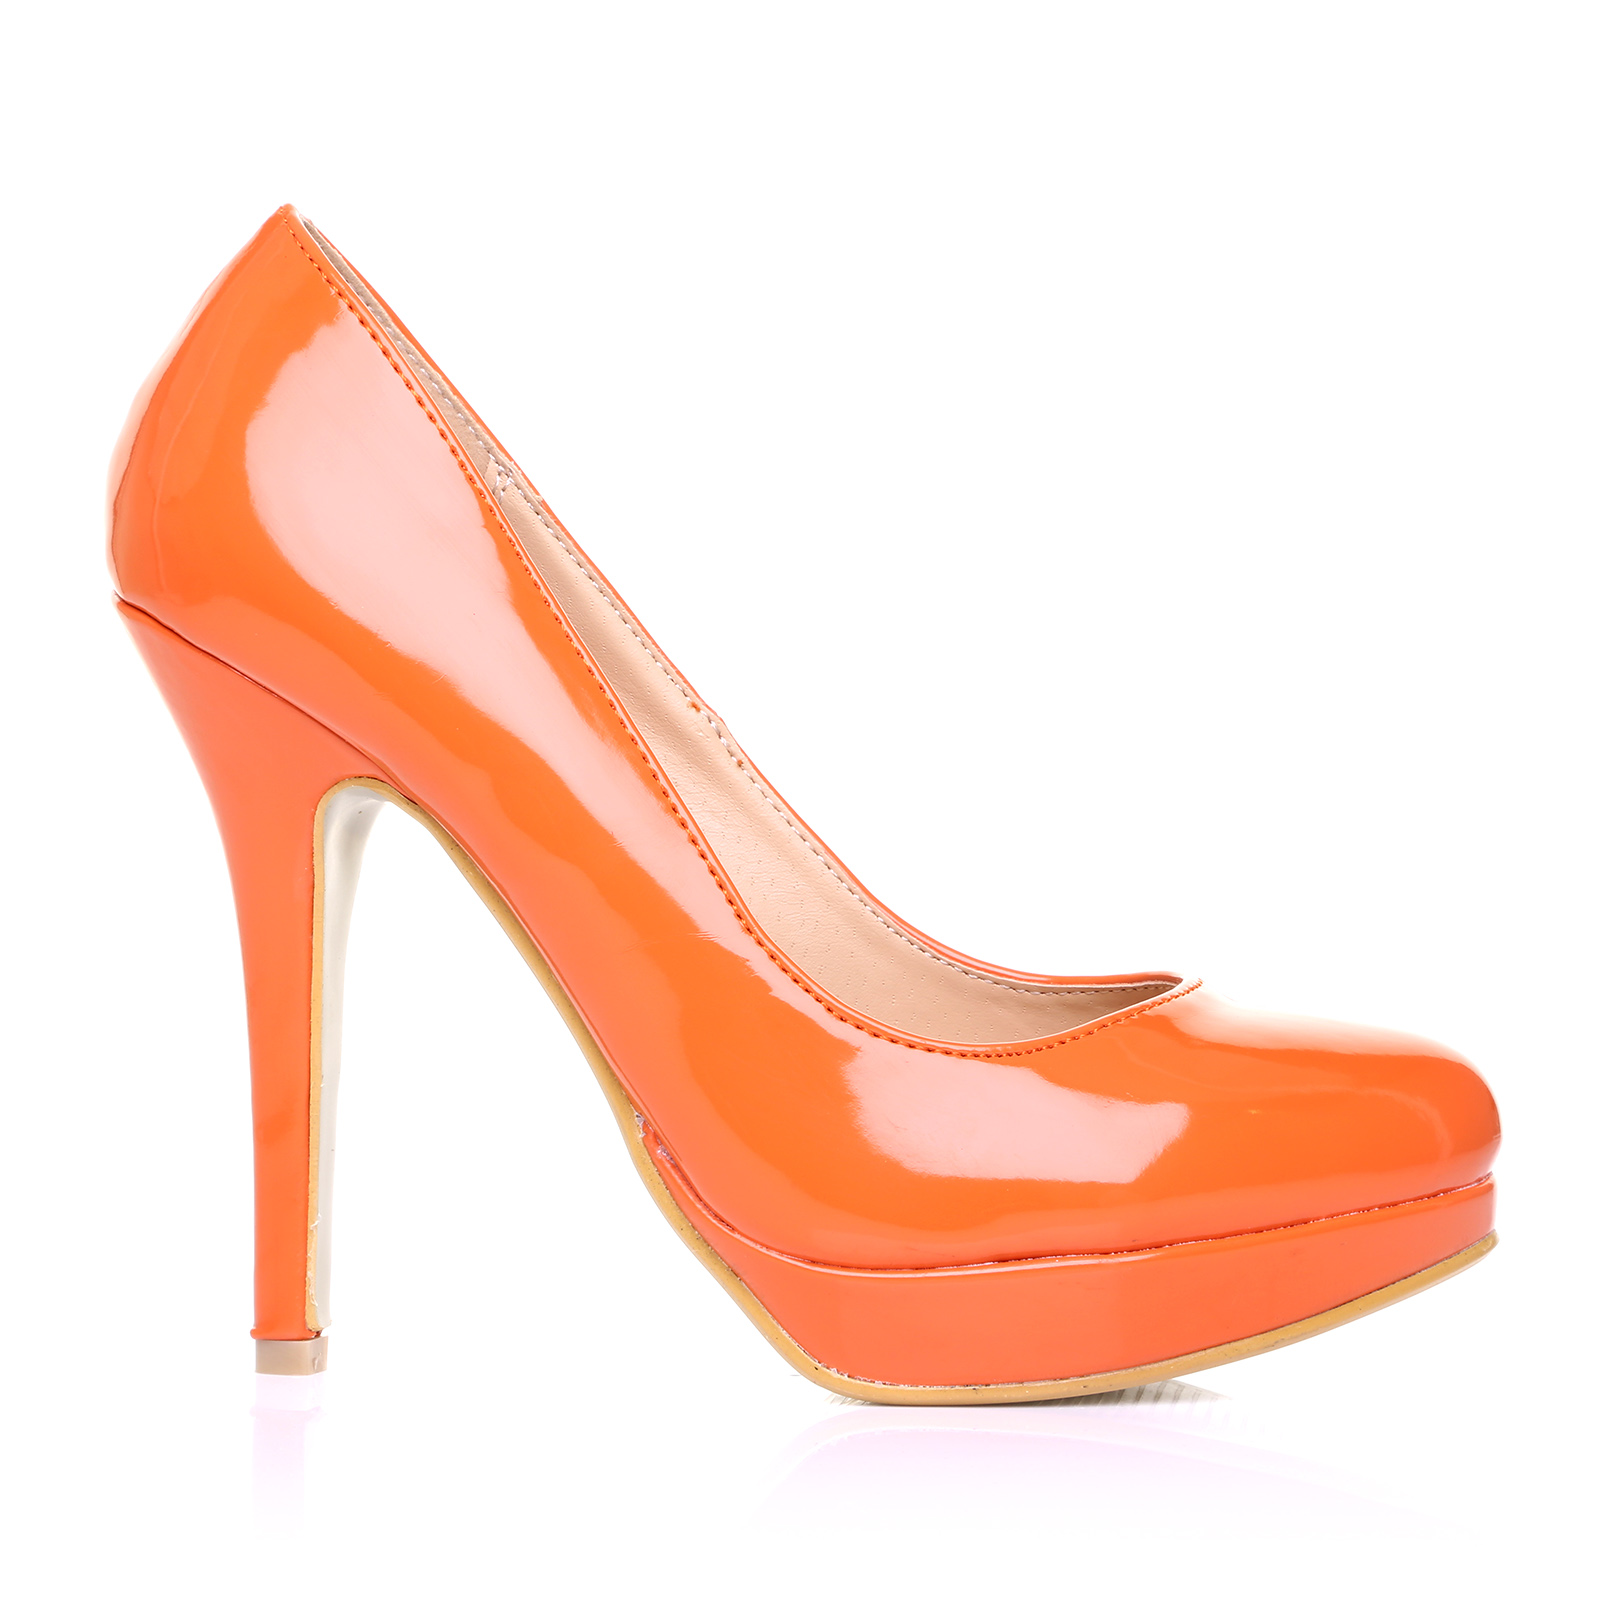 orange patent pu leather stiletto high heel platform